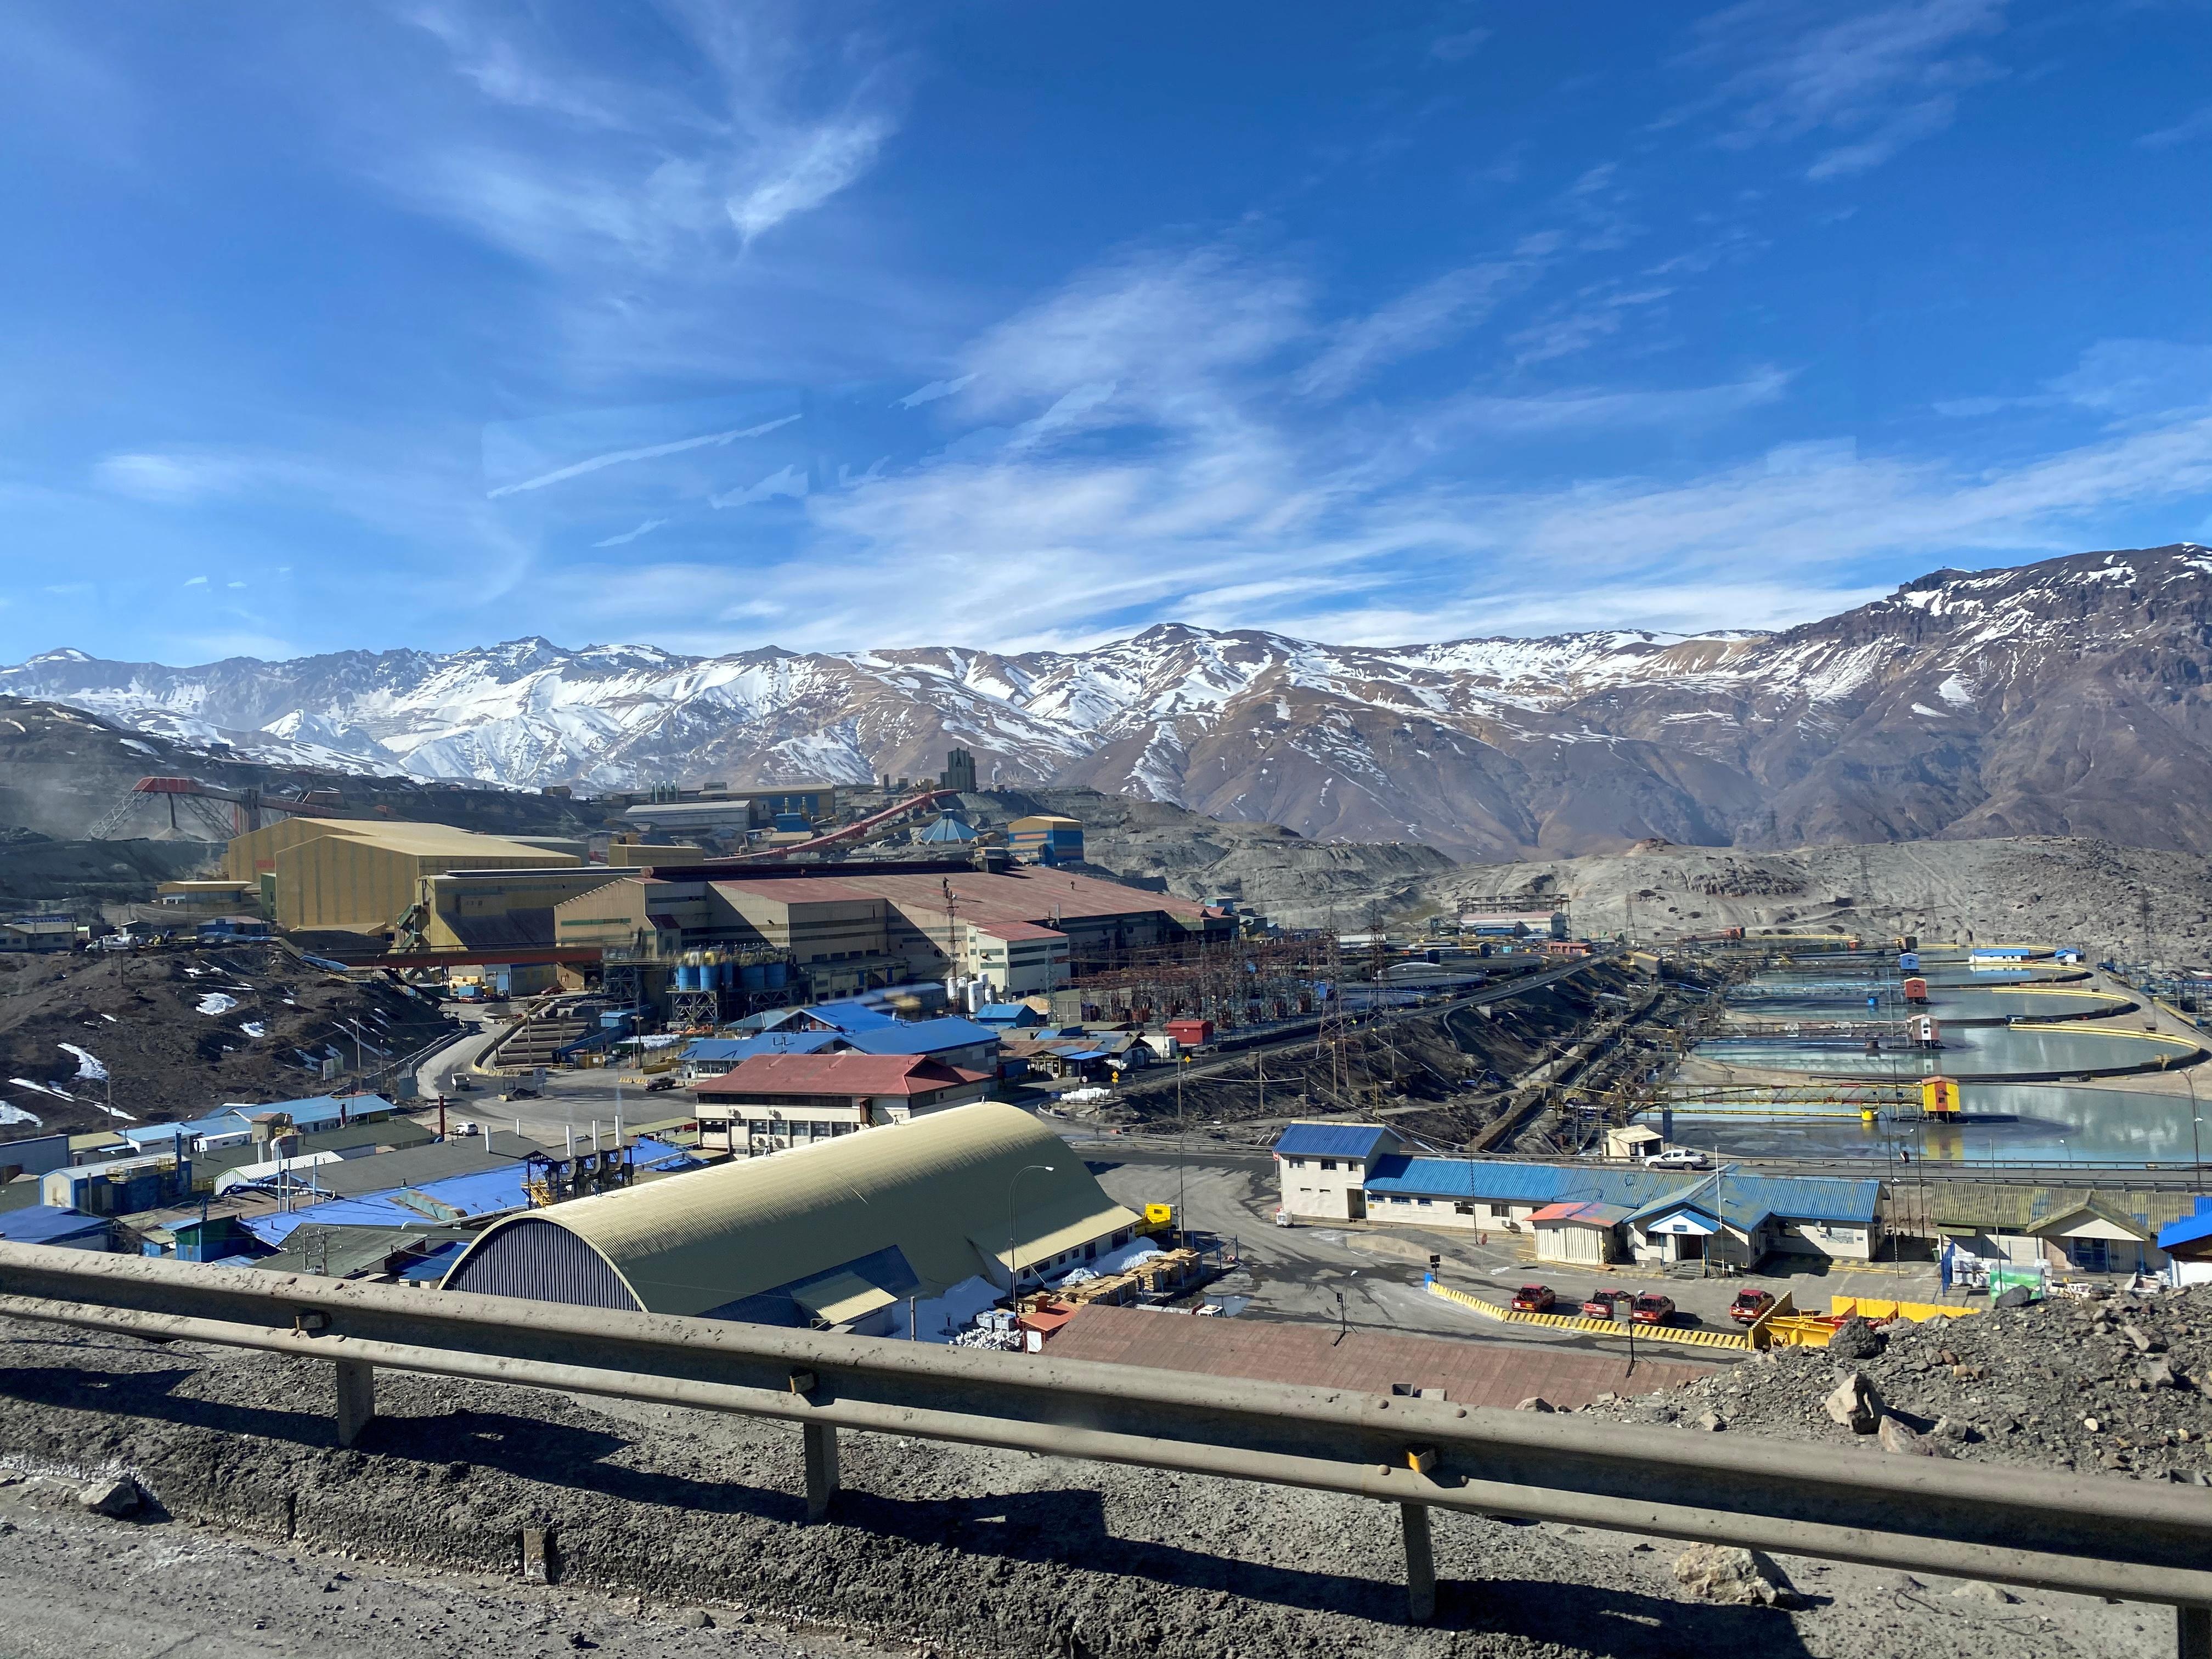 The Codelco El Teniente copper mine, the world's largest underground copper mine is shown near Rancagua, Chile August 13, 2020. Picture taken through a window. REUTERS/Fabian Cambero